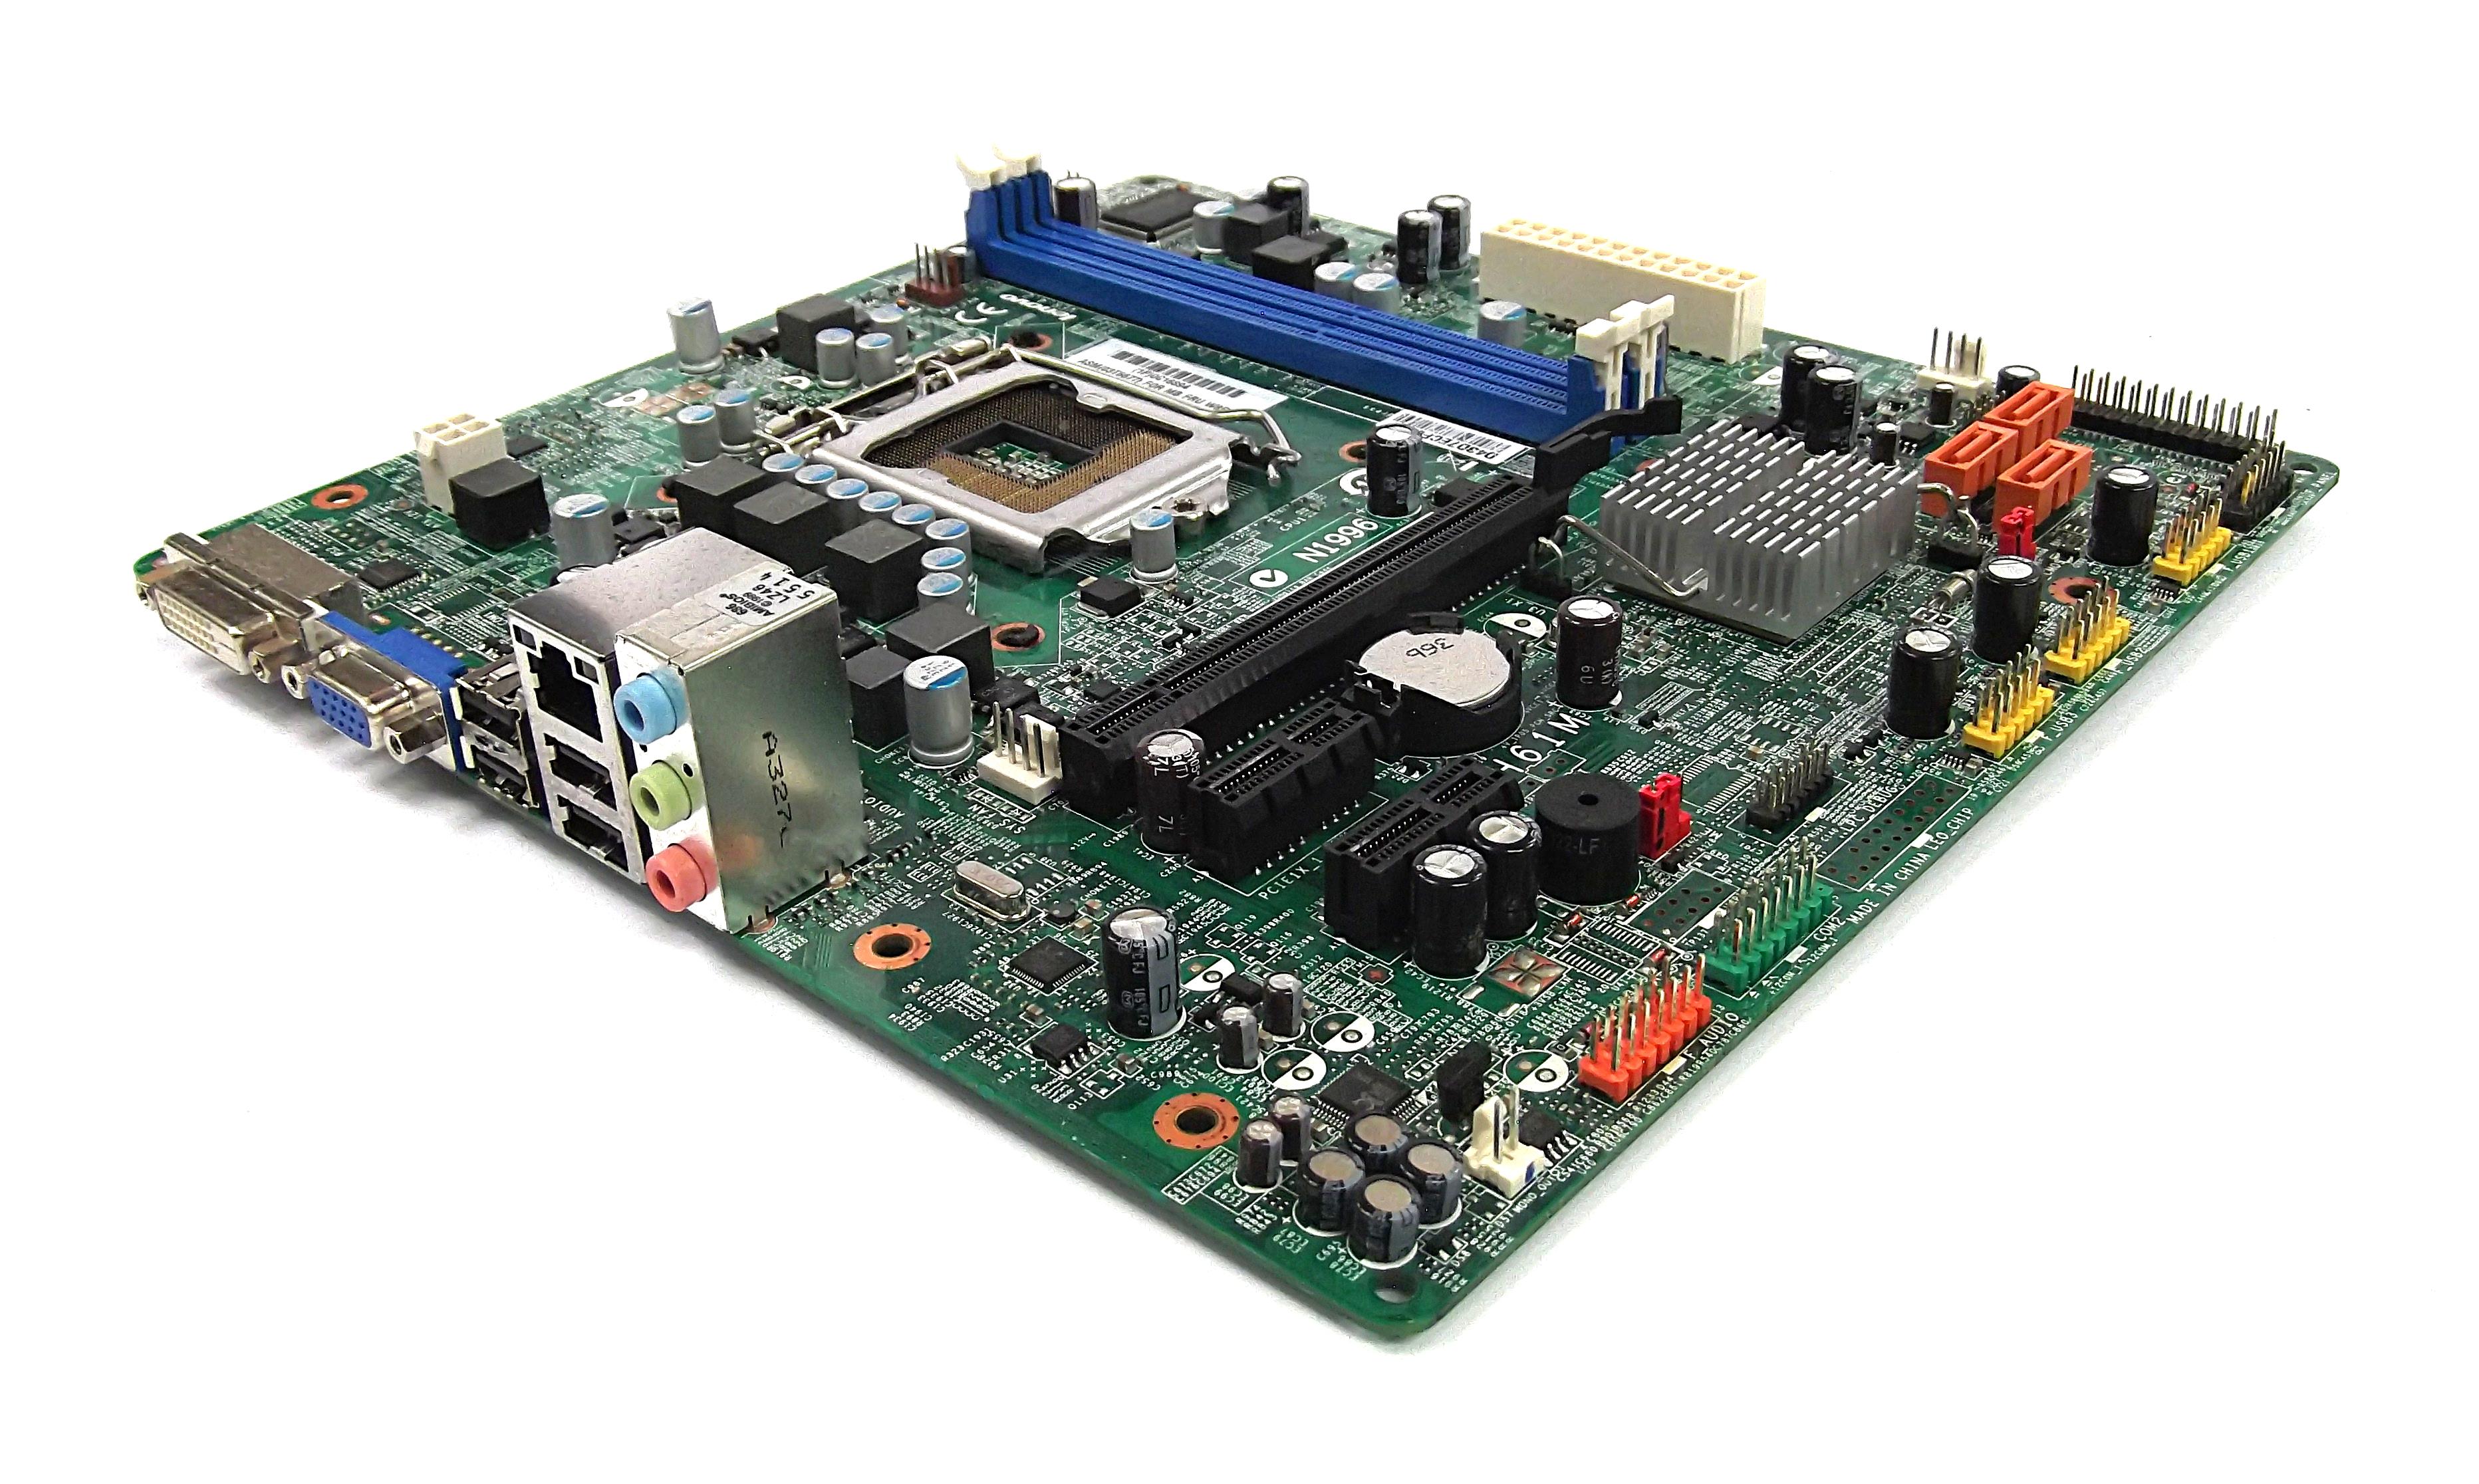 Lenovo 03T6677 ThinkCentre Edge72 Socket 1155 Motherboard IH61M VER:4.2